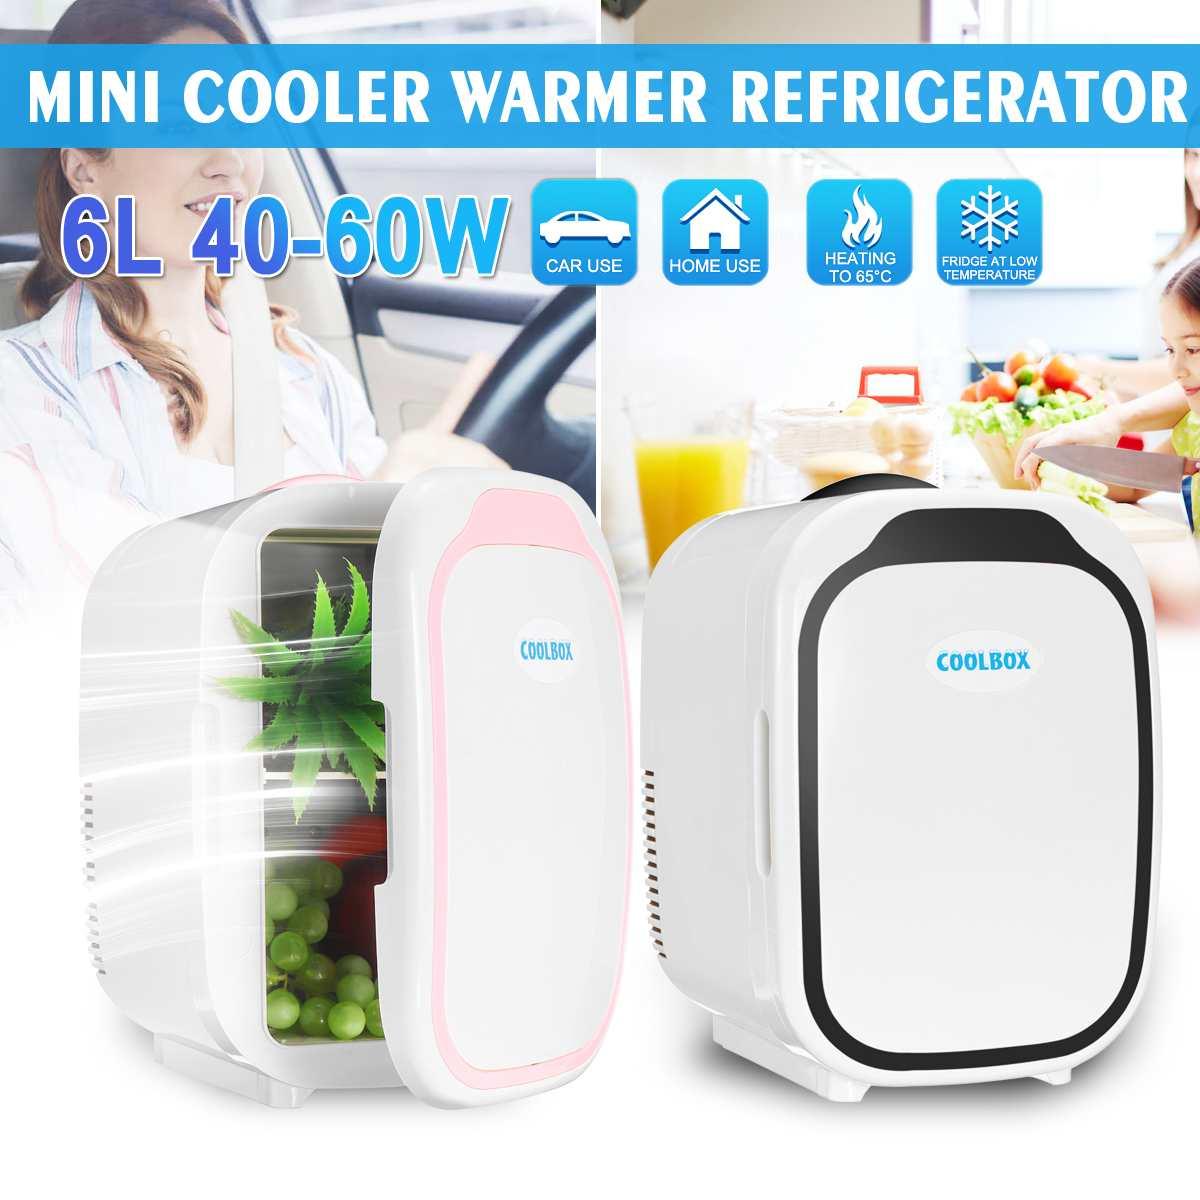 6L Mini Fridge Dual-Use Quiet Refrigerators Low Noise Refrigerators Freezer Cooling Fridge